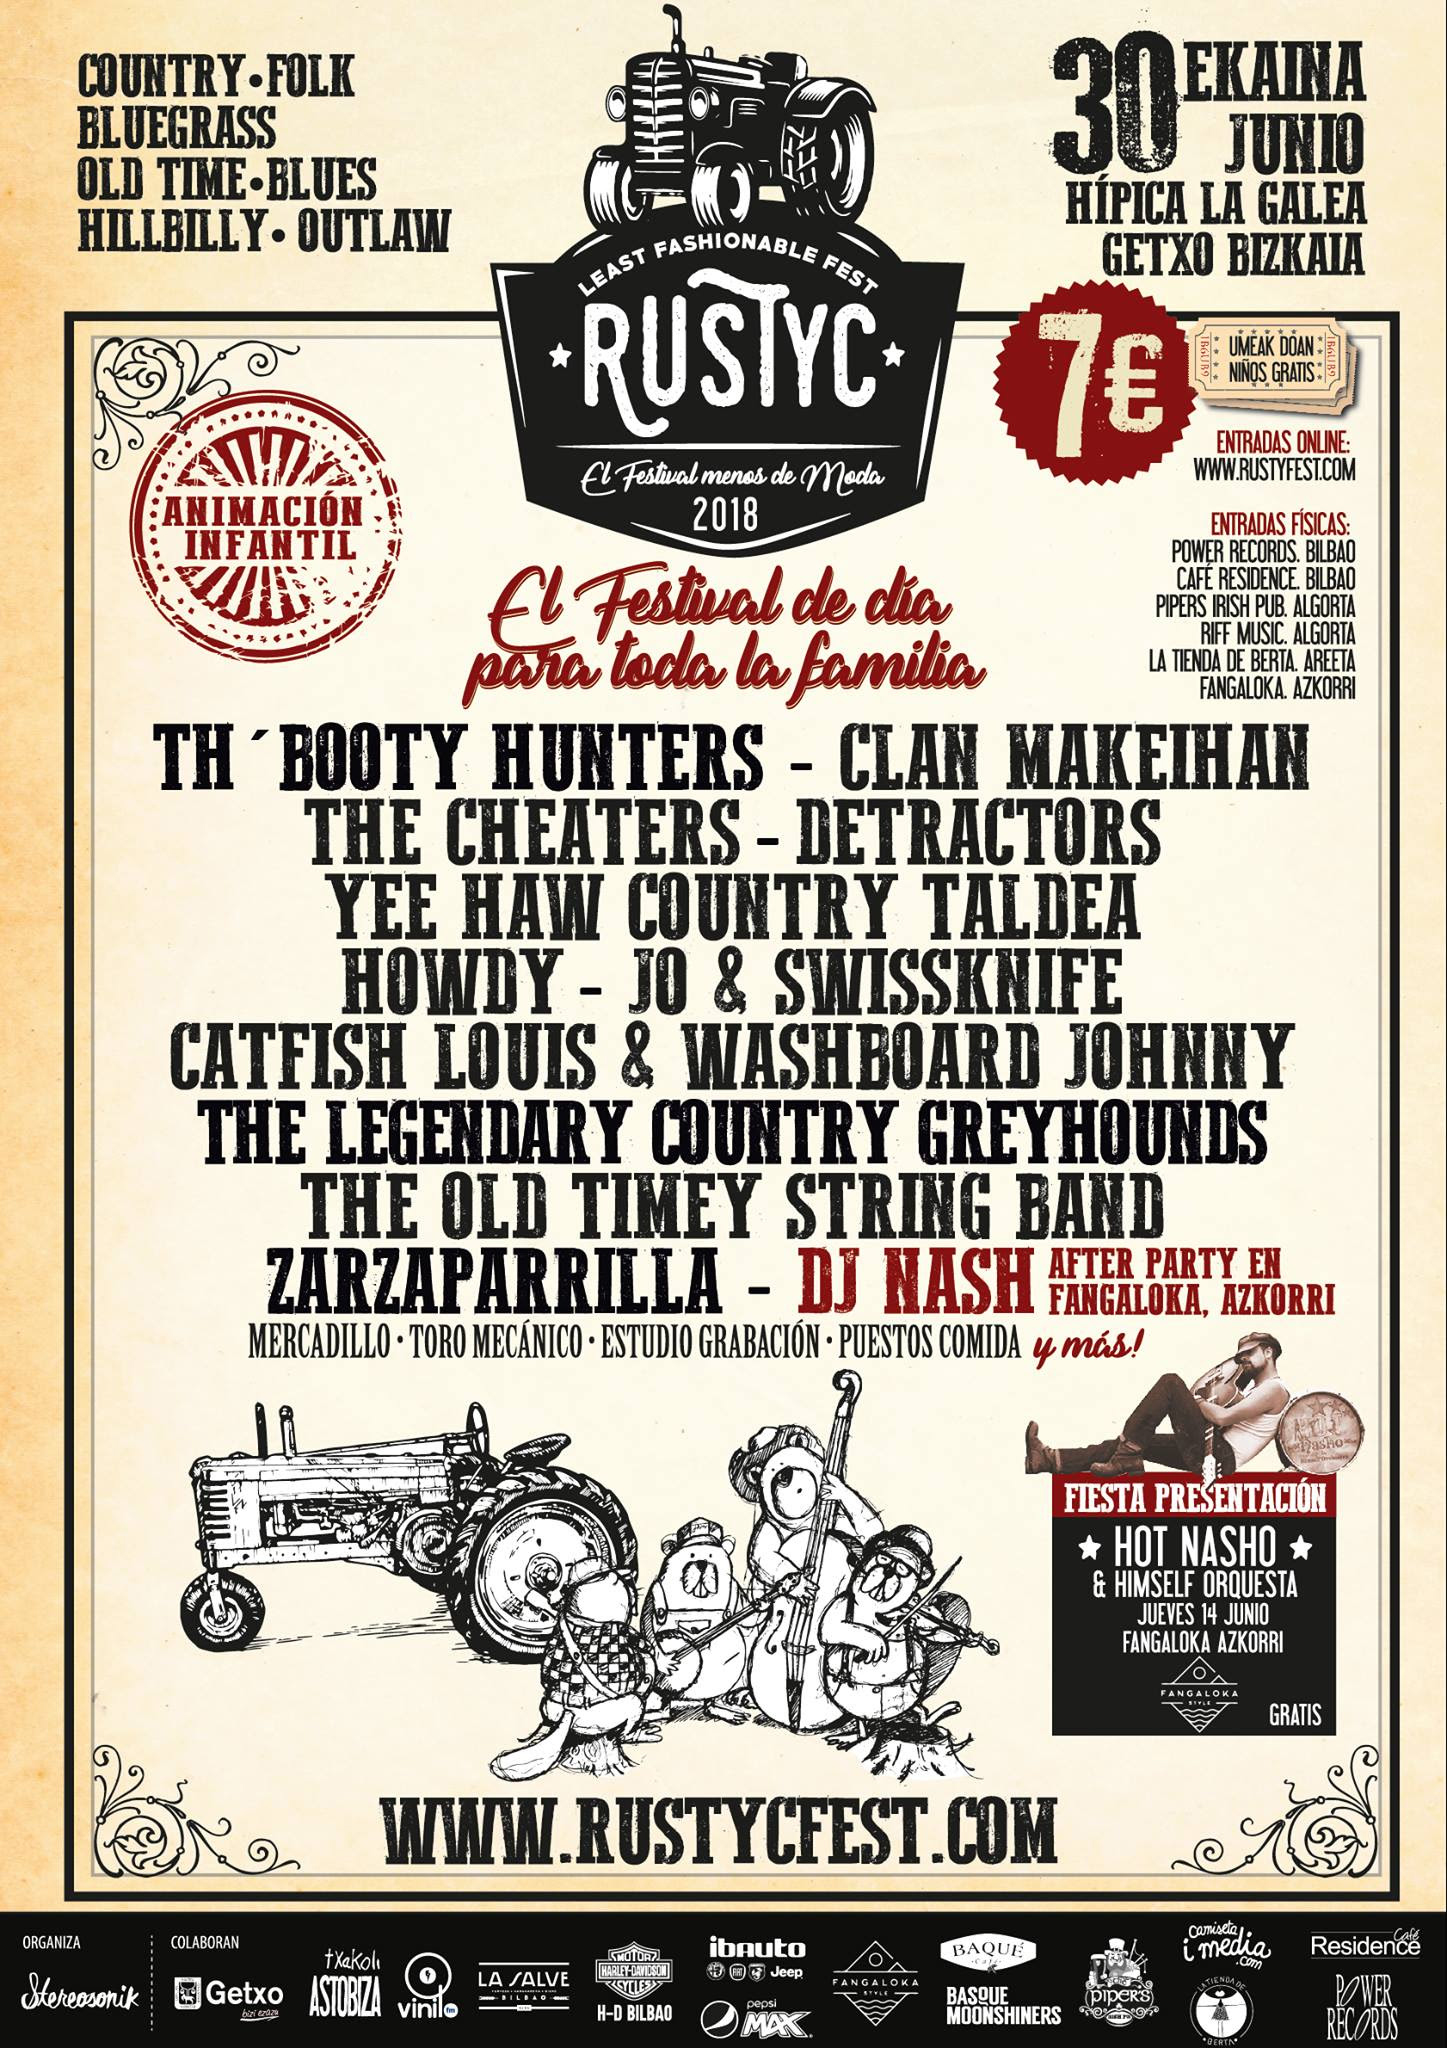 RUSTYC MUSIC FEST La GAlea Getxo